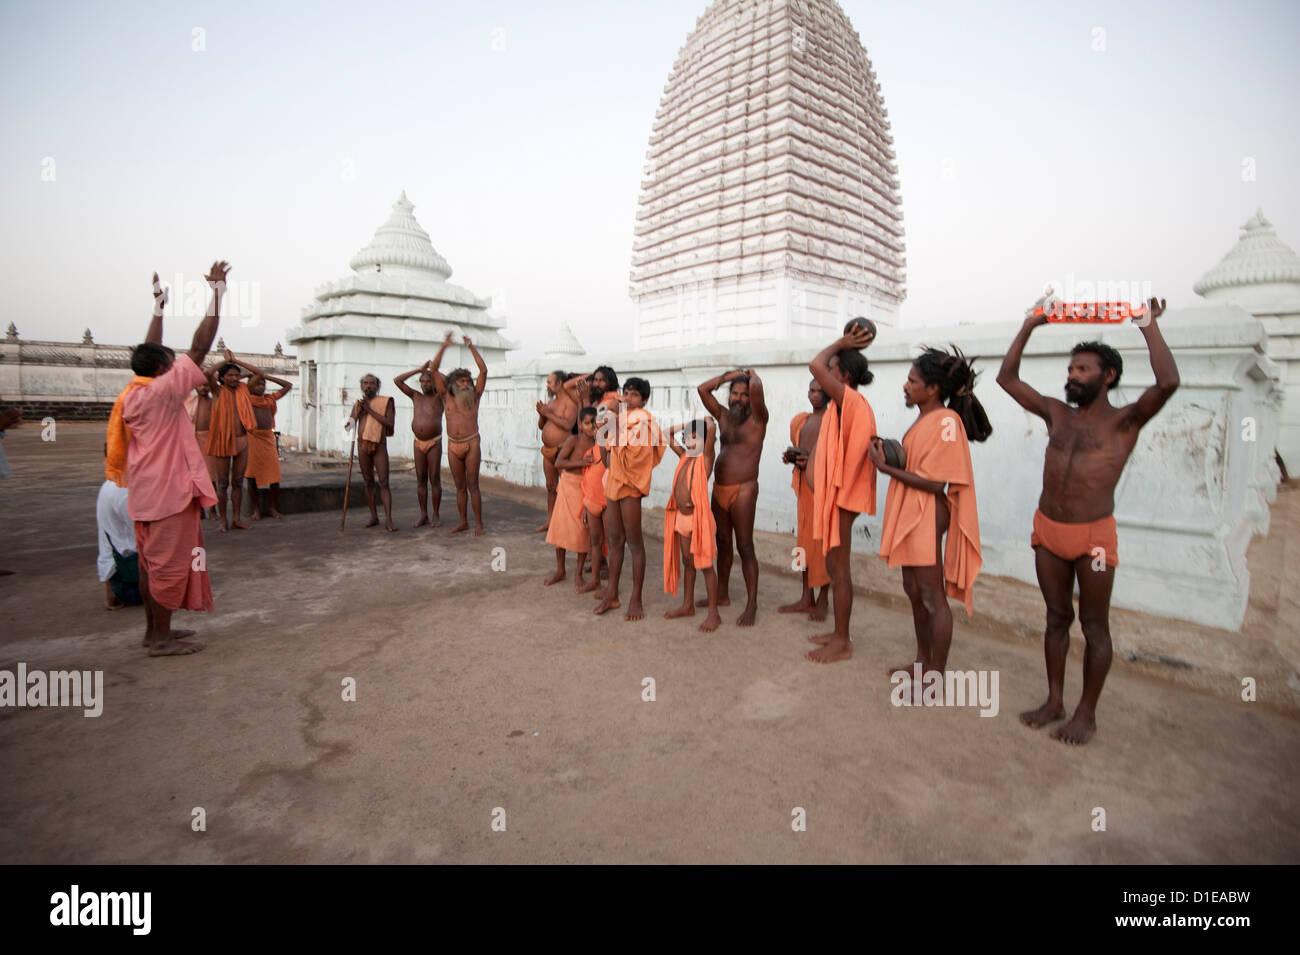 Joranda monks in ritual prayer at dusk at temple containing dhuni, eternal butter lamp, Joranda, Dhenkanal, Orissa, - Stock Image